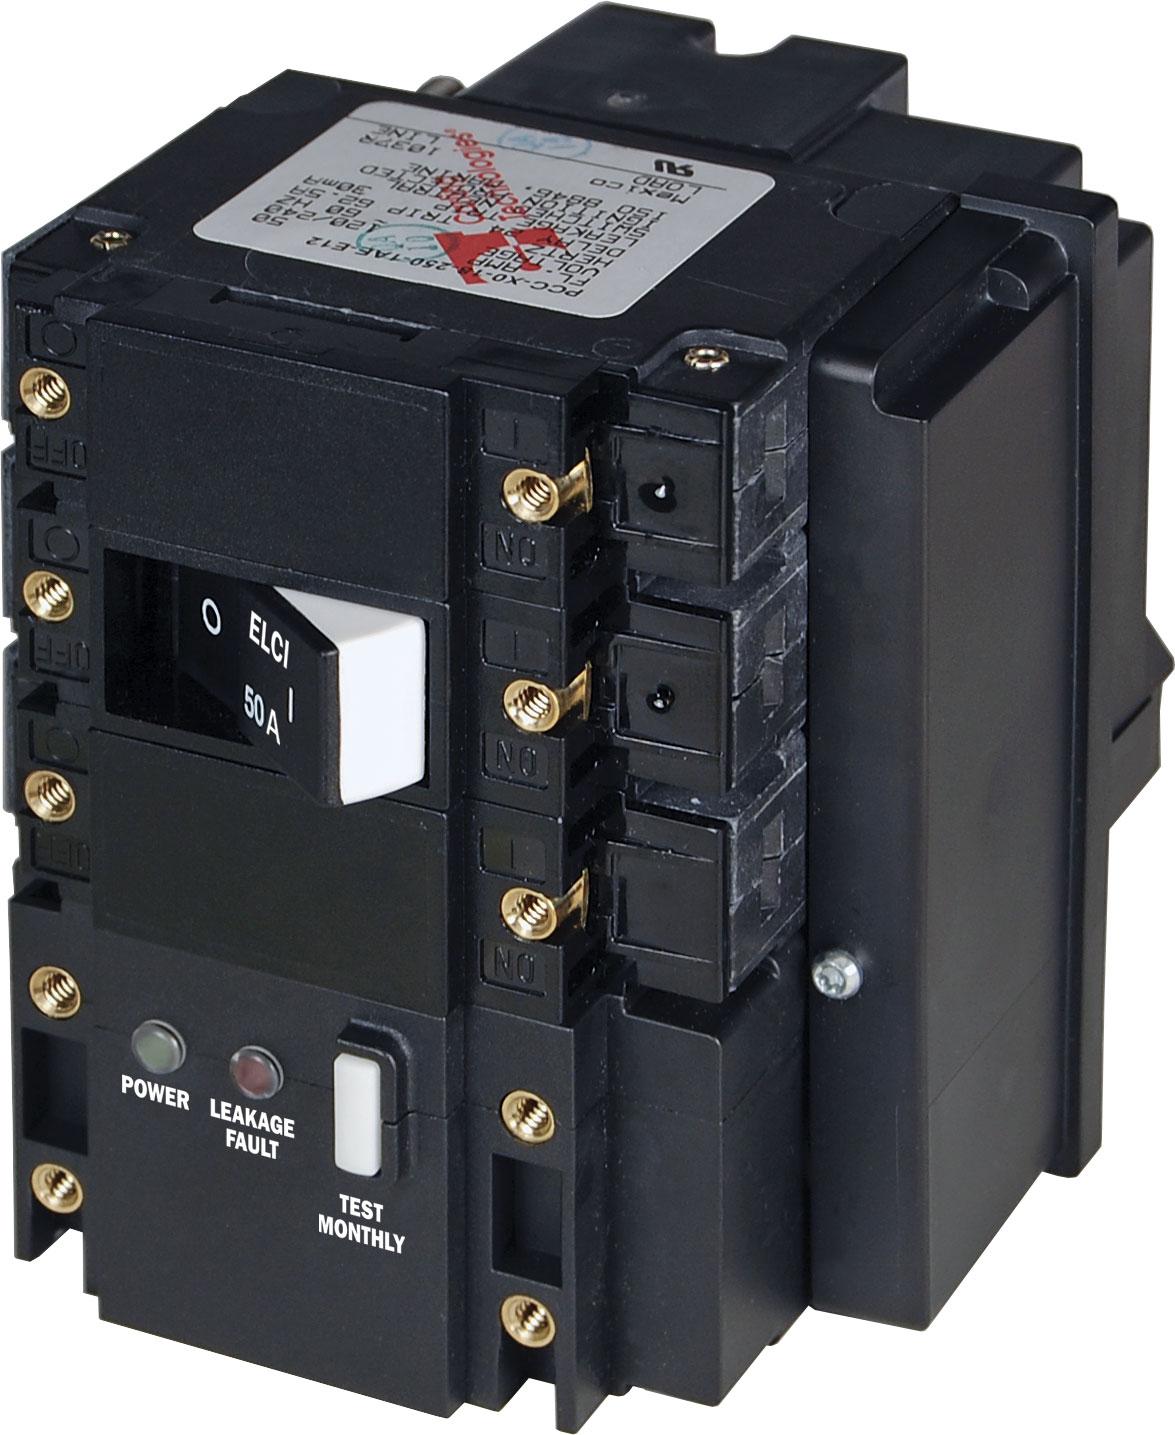 c series elci main circuit breaker 120 240v ac 50a. Black Bedroom Furniture Sets. Home Design Ideas